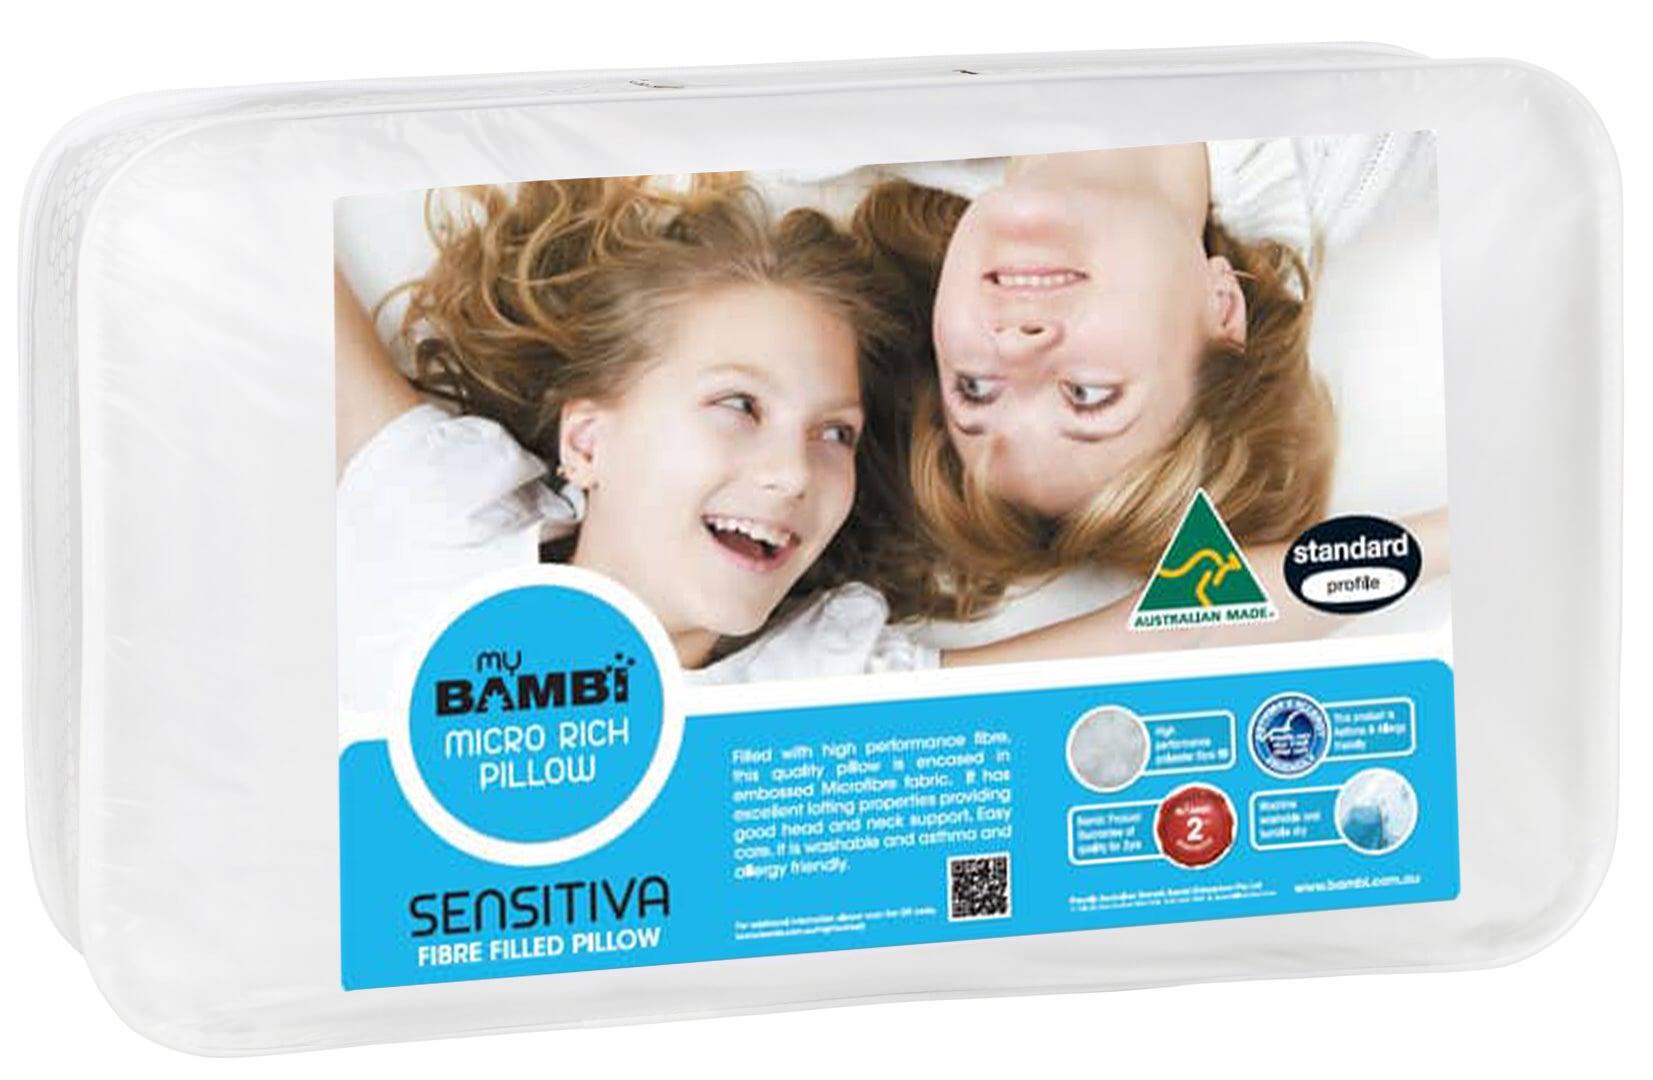 Sensitiva Embossed Micro Rich Pillow